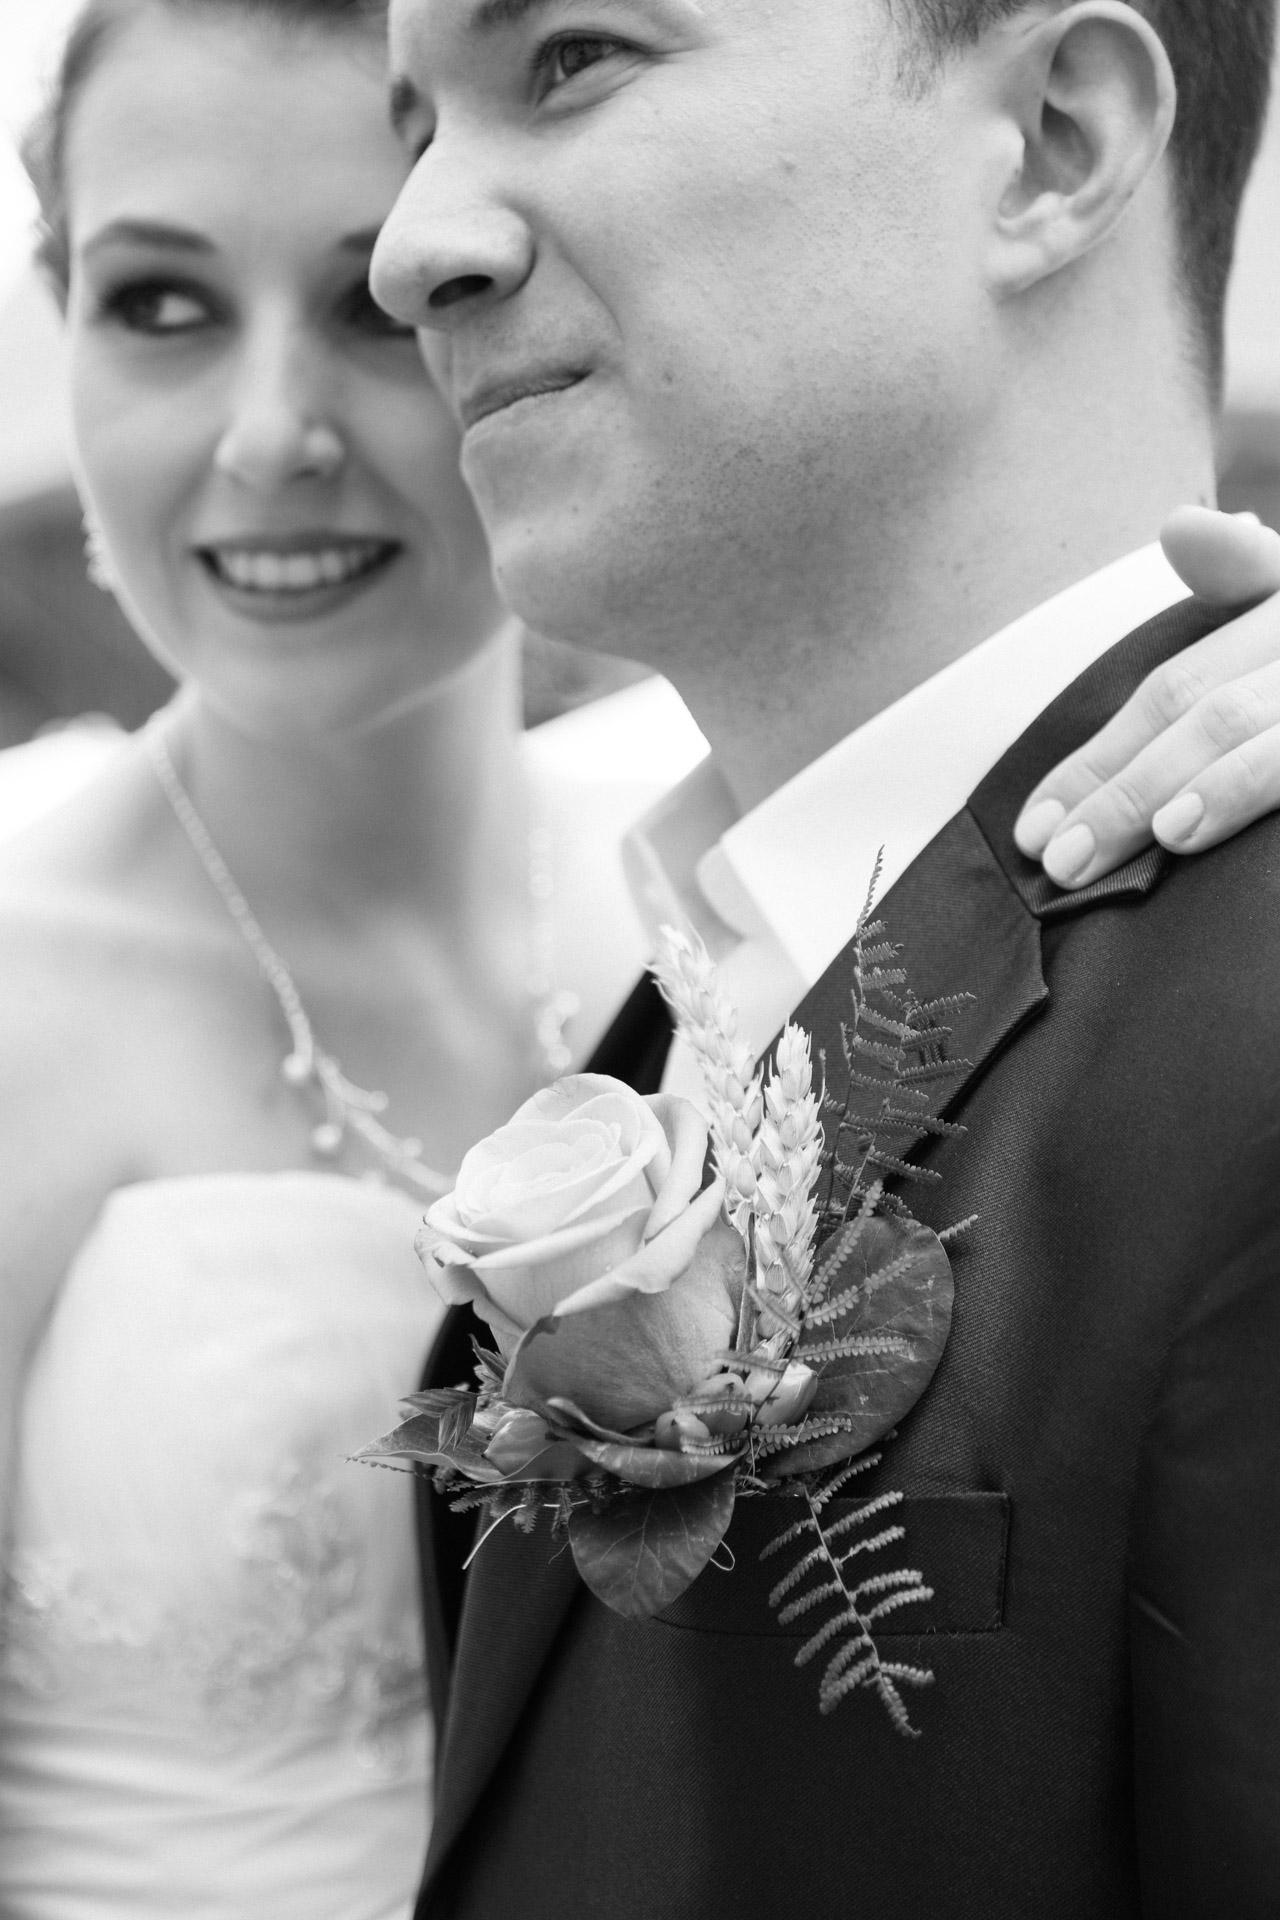 Pixelart_Hochzeitsfotografen_Loerrach_Rheinfelden_Hallwil_Schweiz_Linda-Ramon-1014